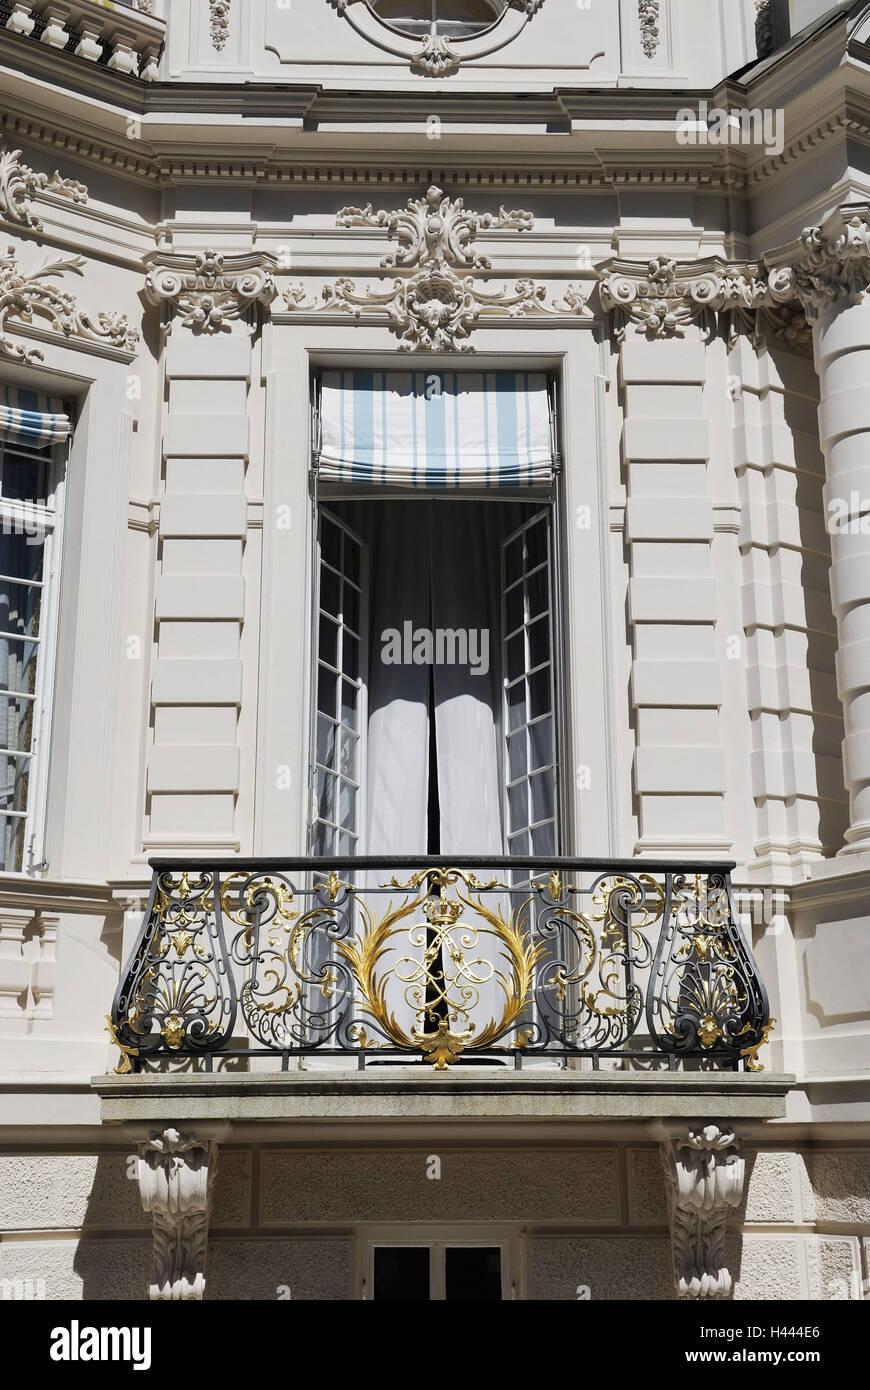 Lock gentle court, facade, window, casement, curtain, balcony, grid, pillar, Germany, Bavarians, Upper Bavaria, - Stock Image